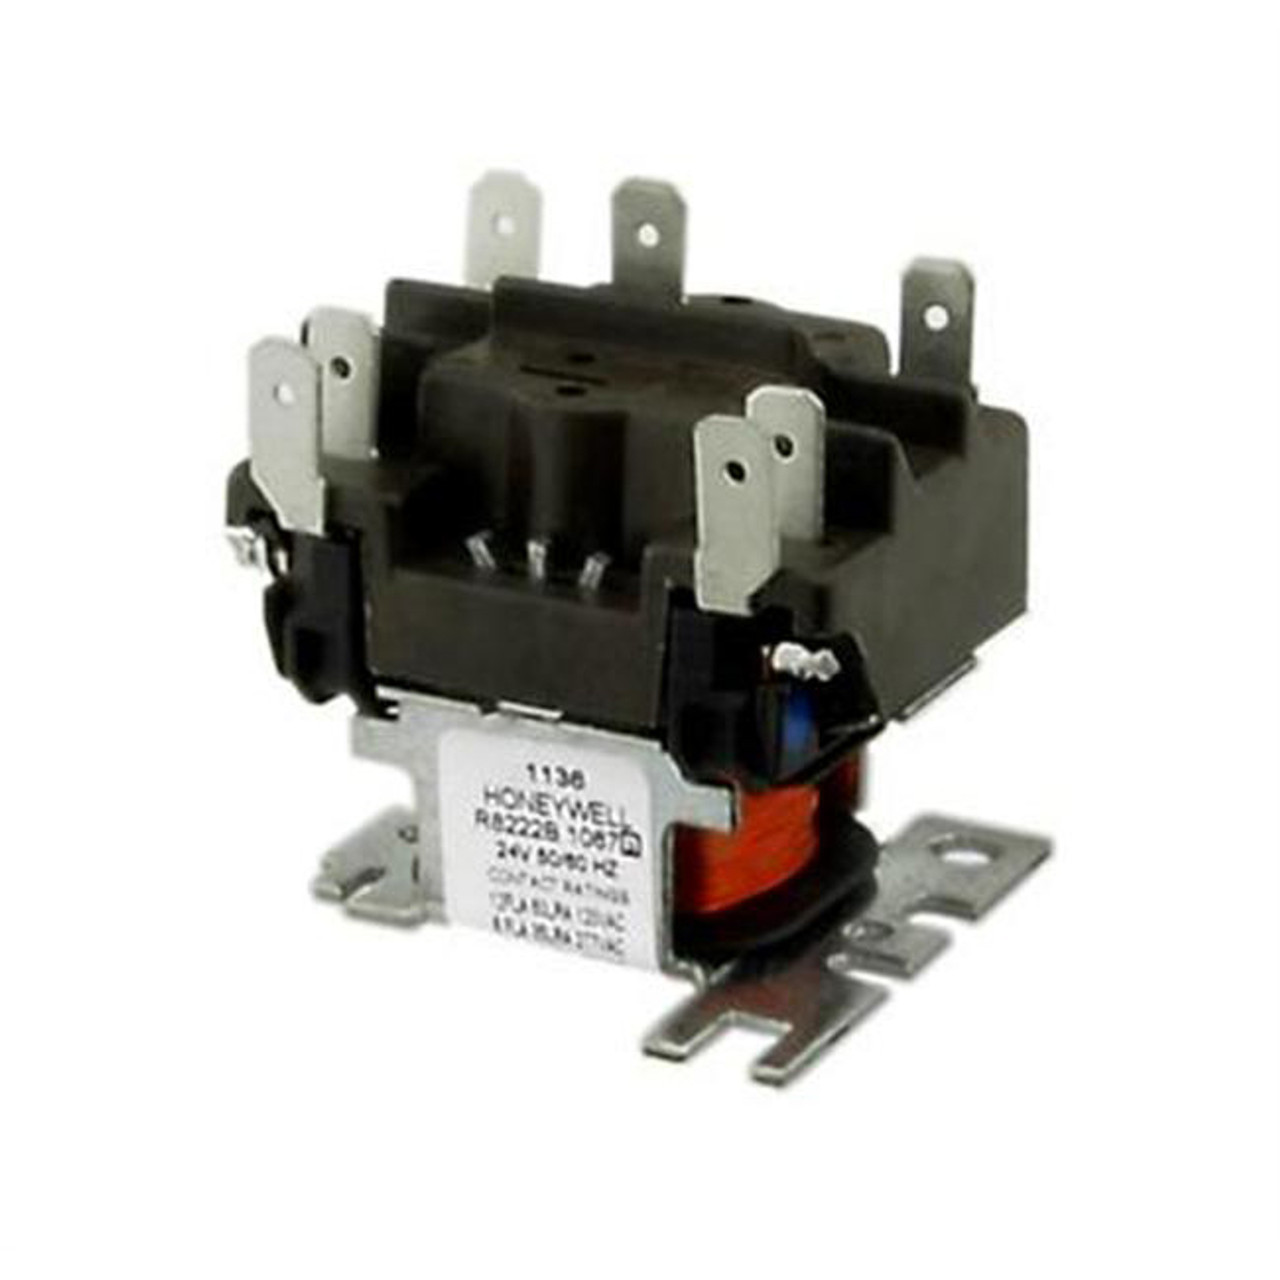 24vac dpdt relay wiring diagram [ 1280 x 1280 Pixel ]